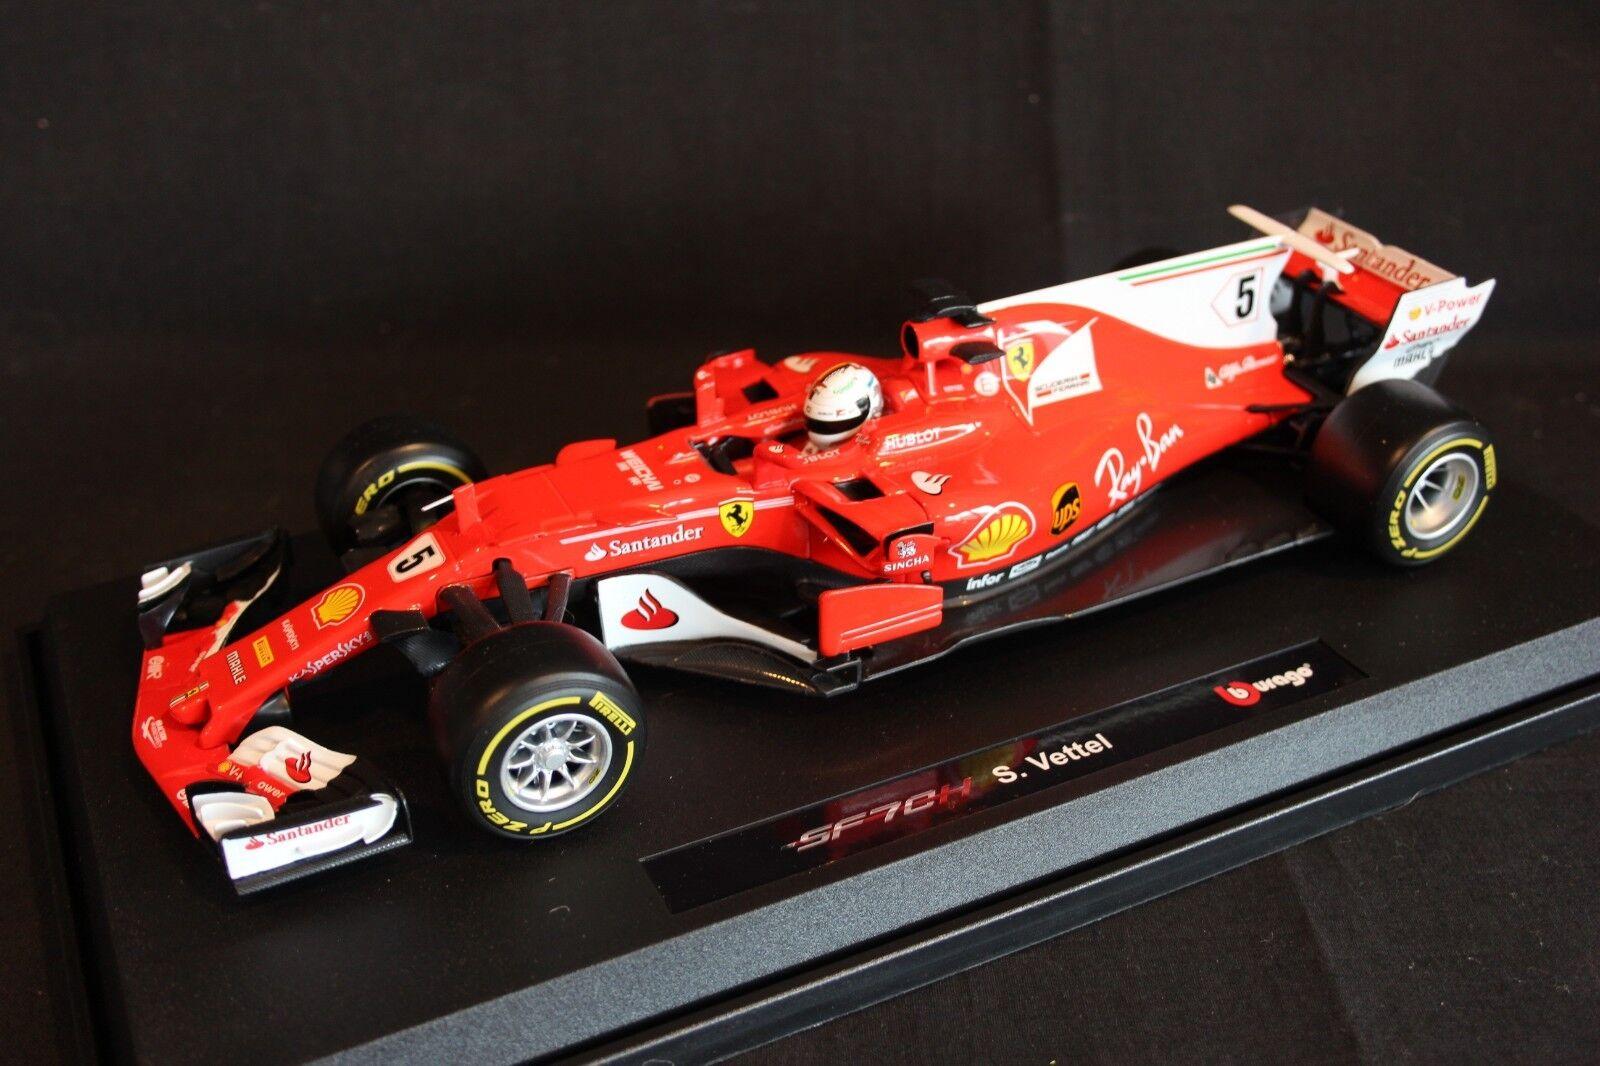 Bburago Ferrari SF70H 2017 1 18  5 Sebsatian Vettel (GER)